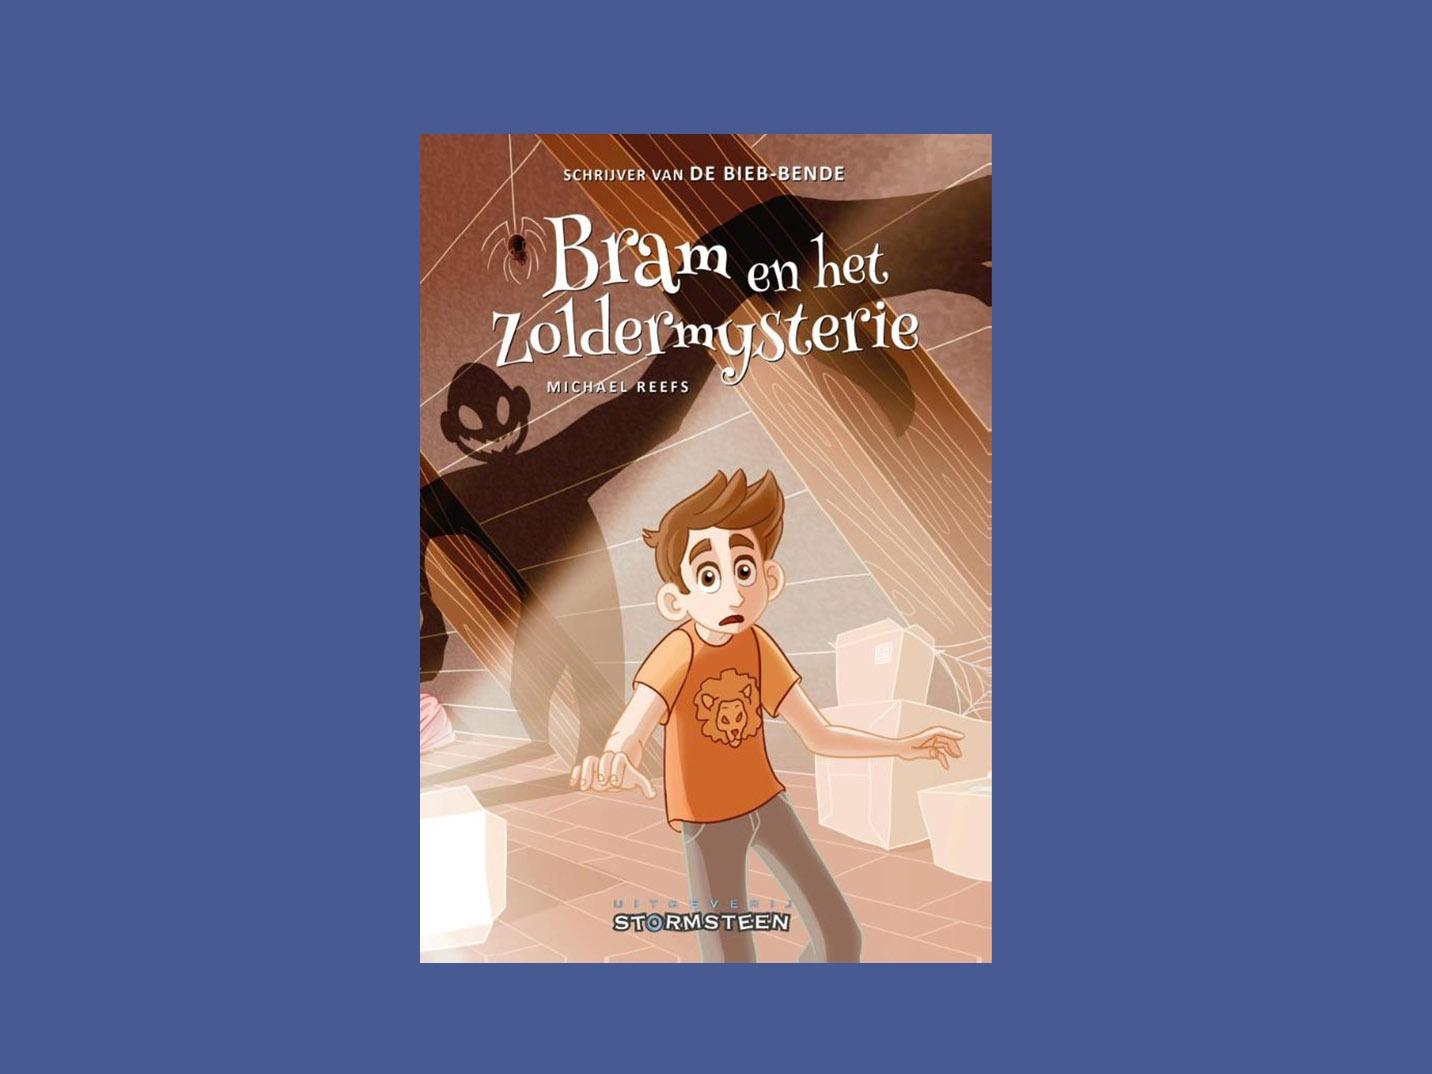 Boekbespreking Bram en het zoldermysterie